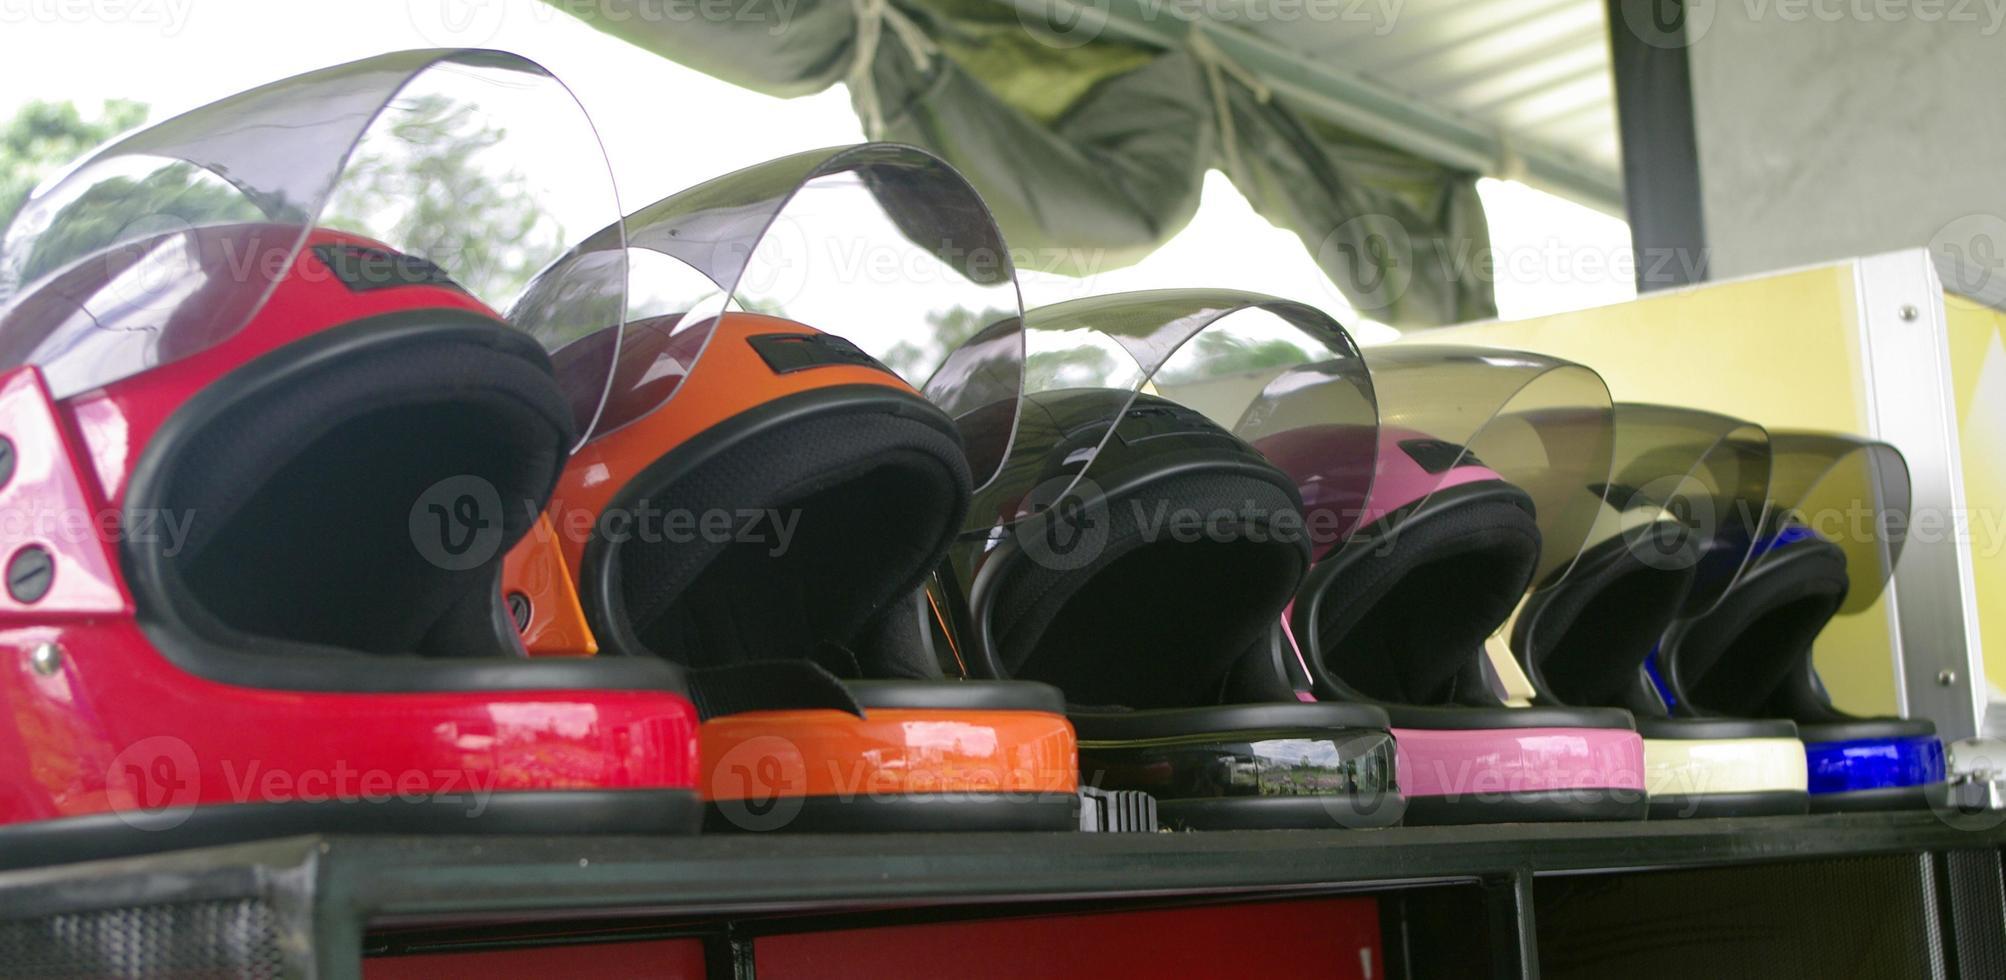 cascos de bicicleta de colores foto